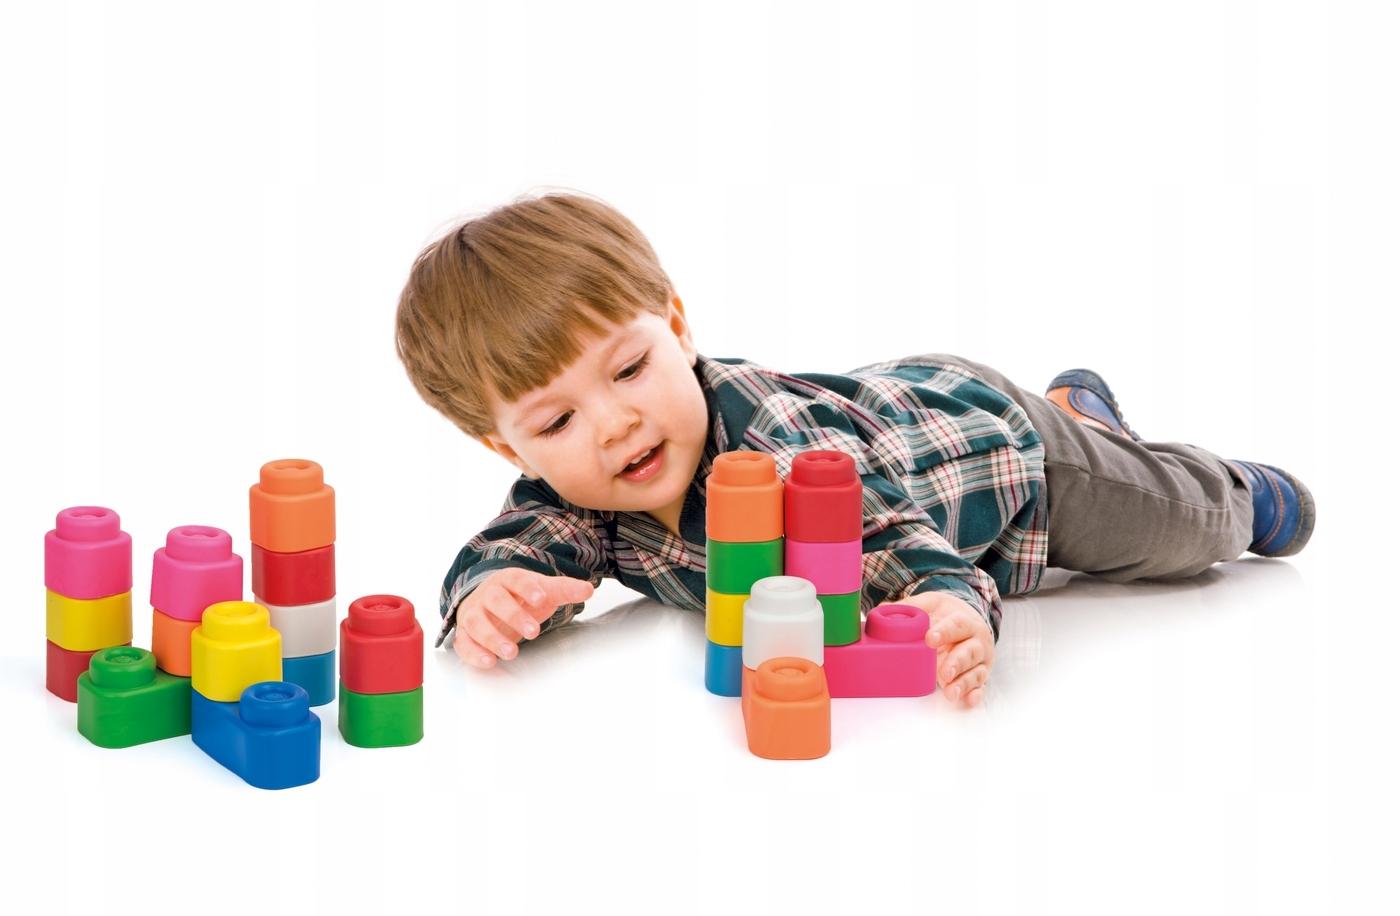 Дети и кубики картинки